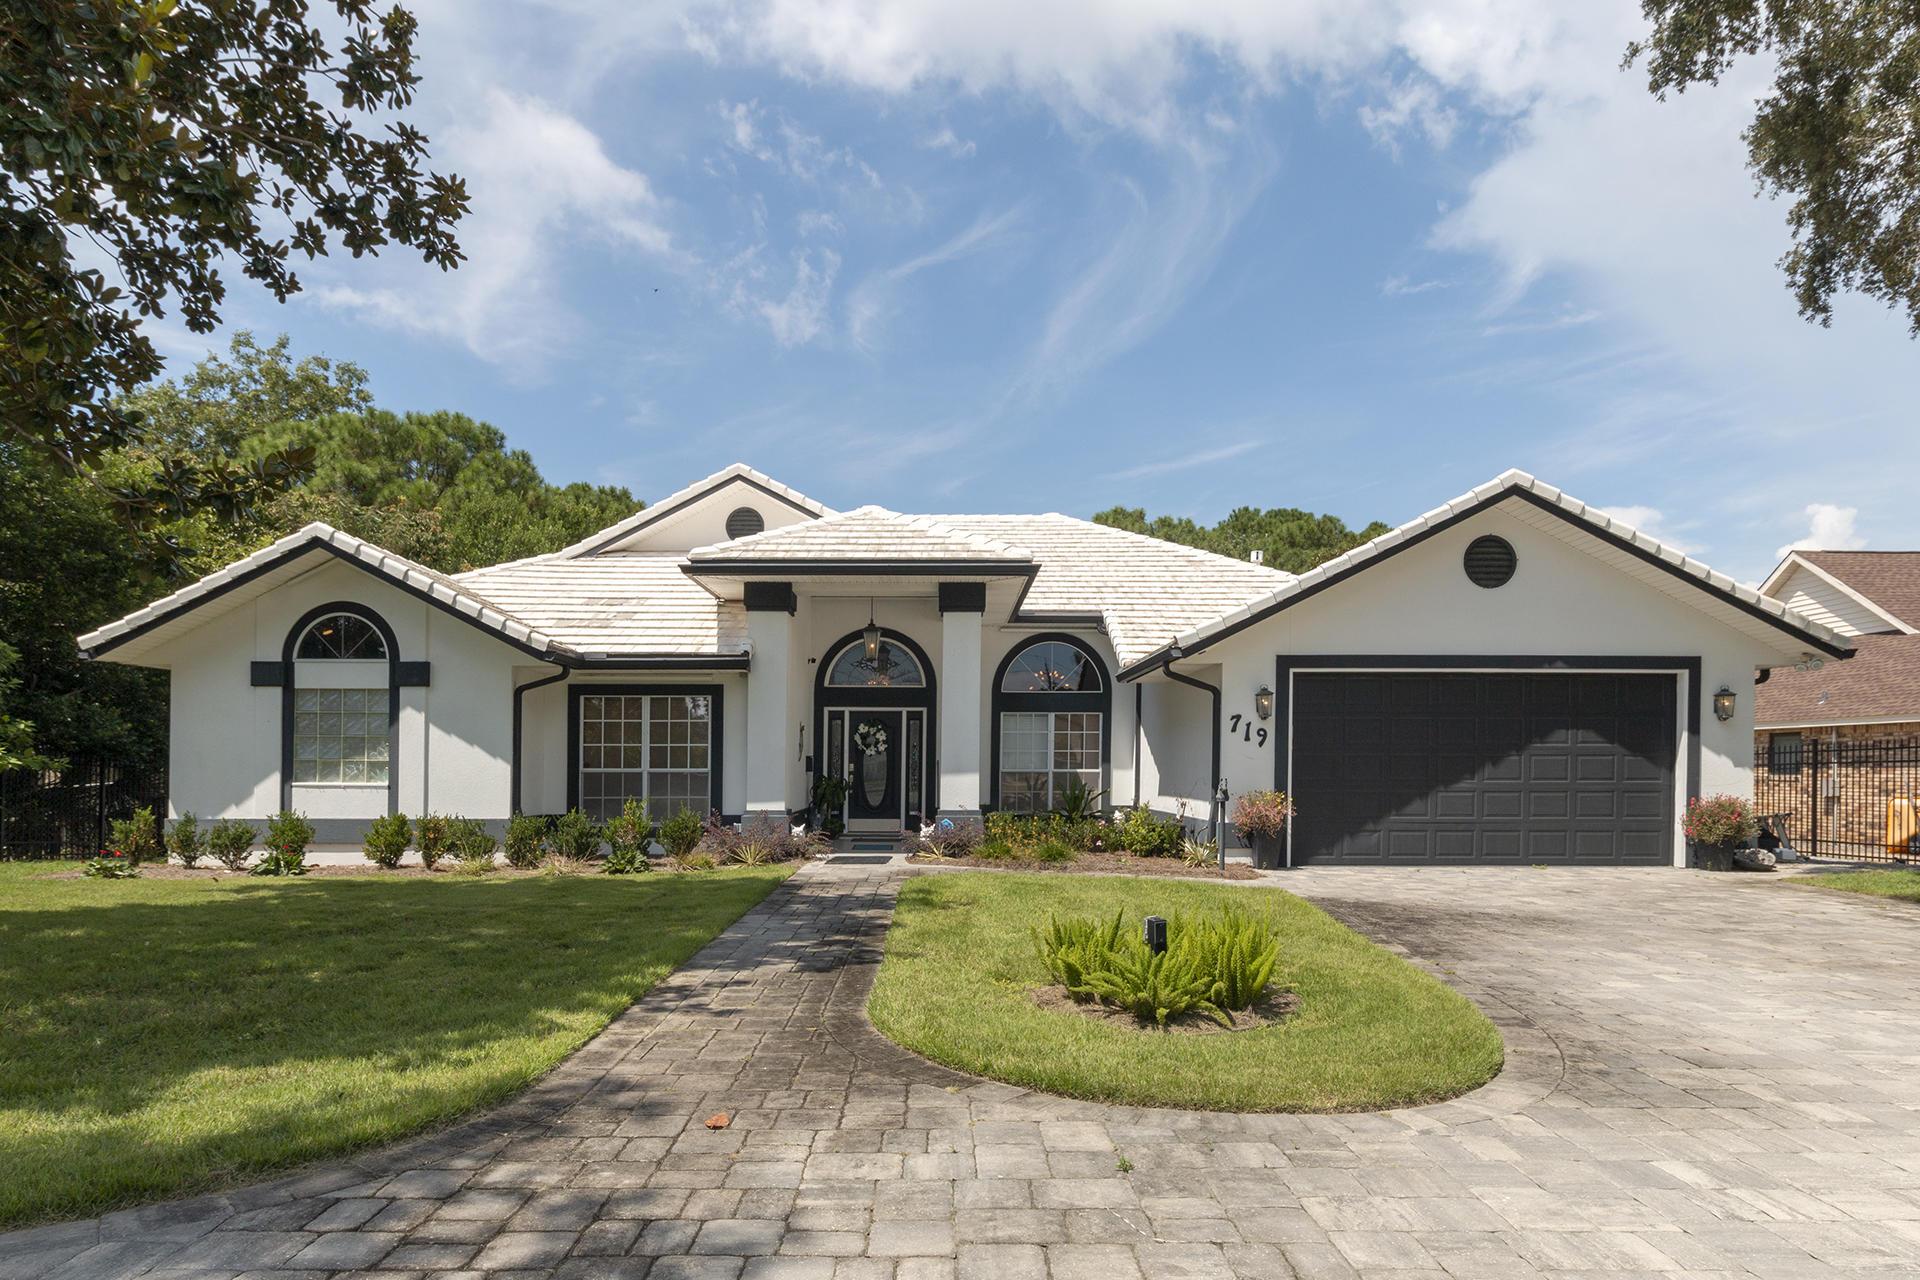 Destin Real Estate Listing, featured MLS property E807311